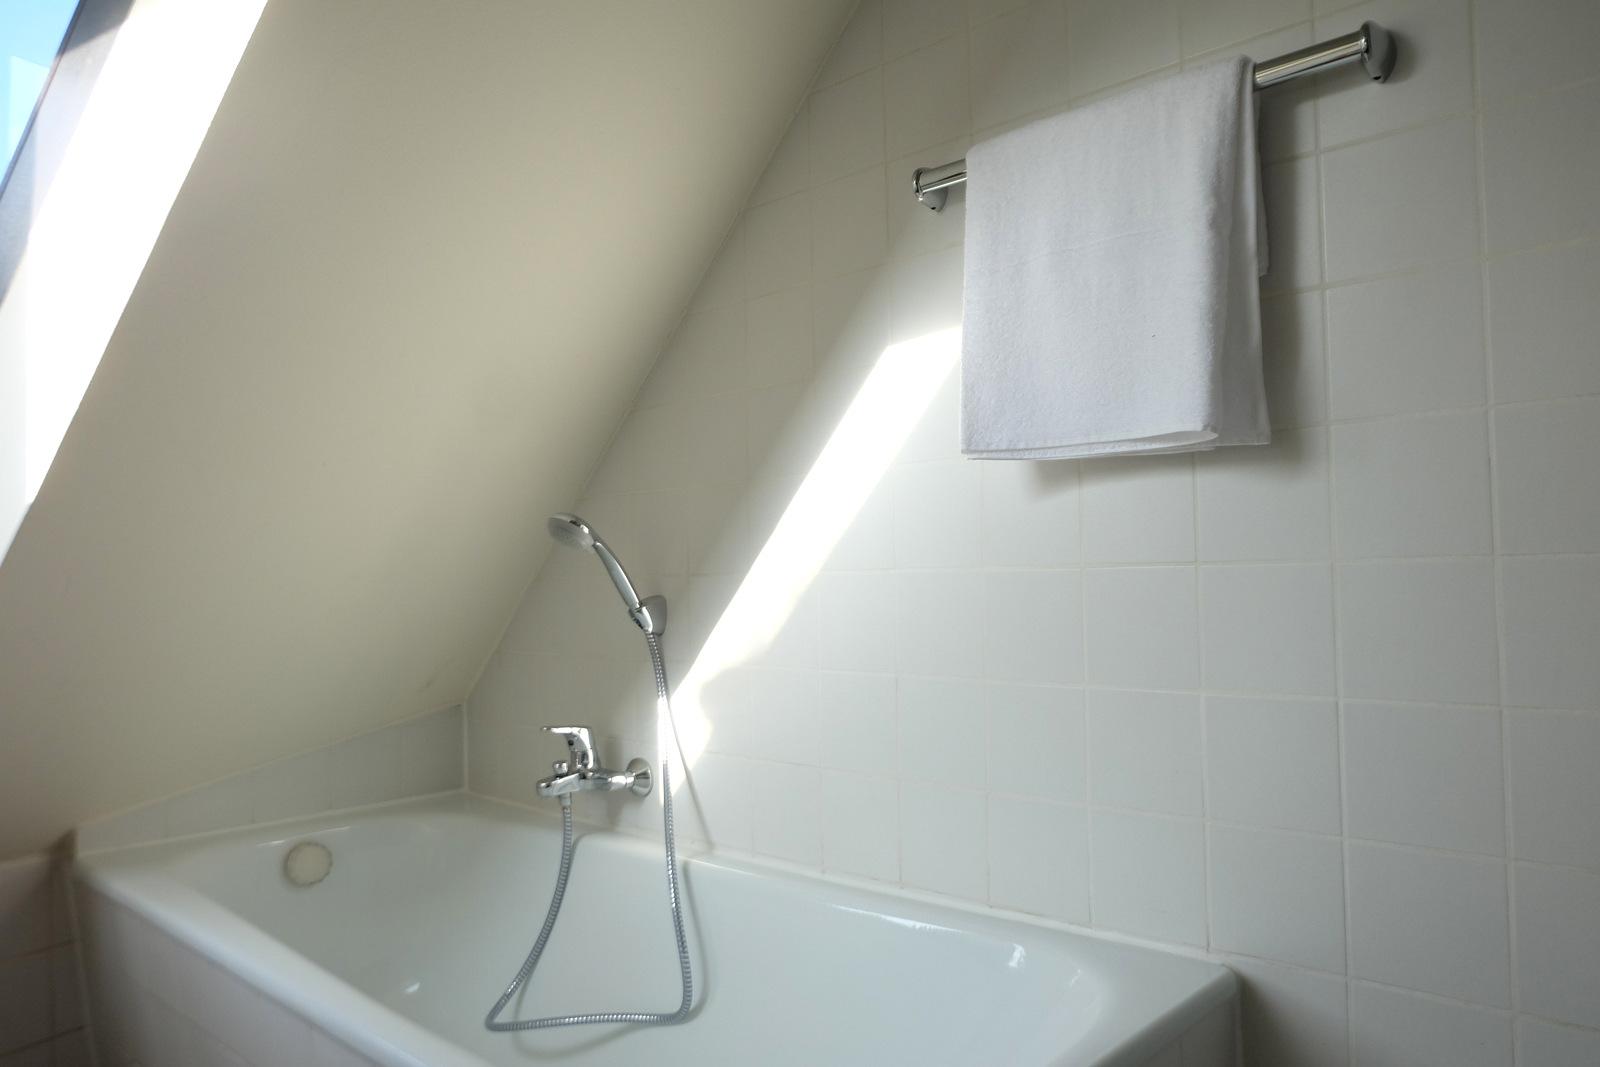 dscf1593 Roof apartment %Bockenheim